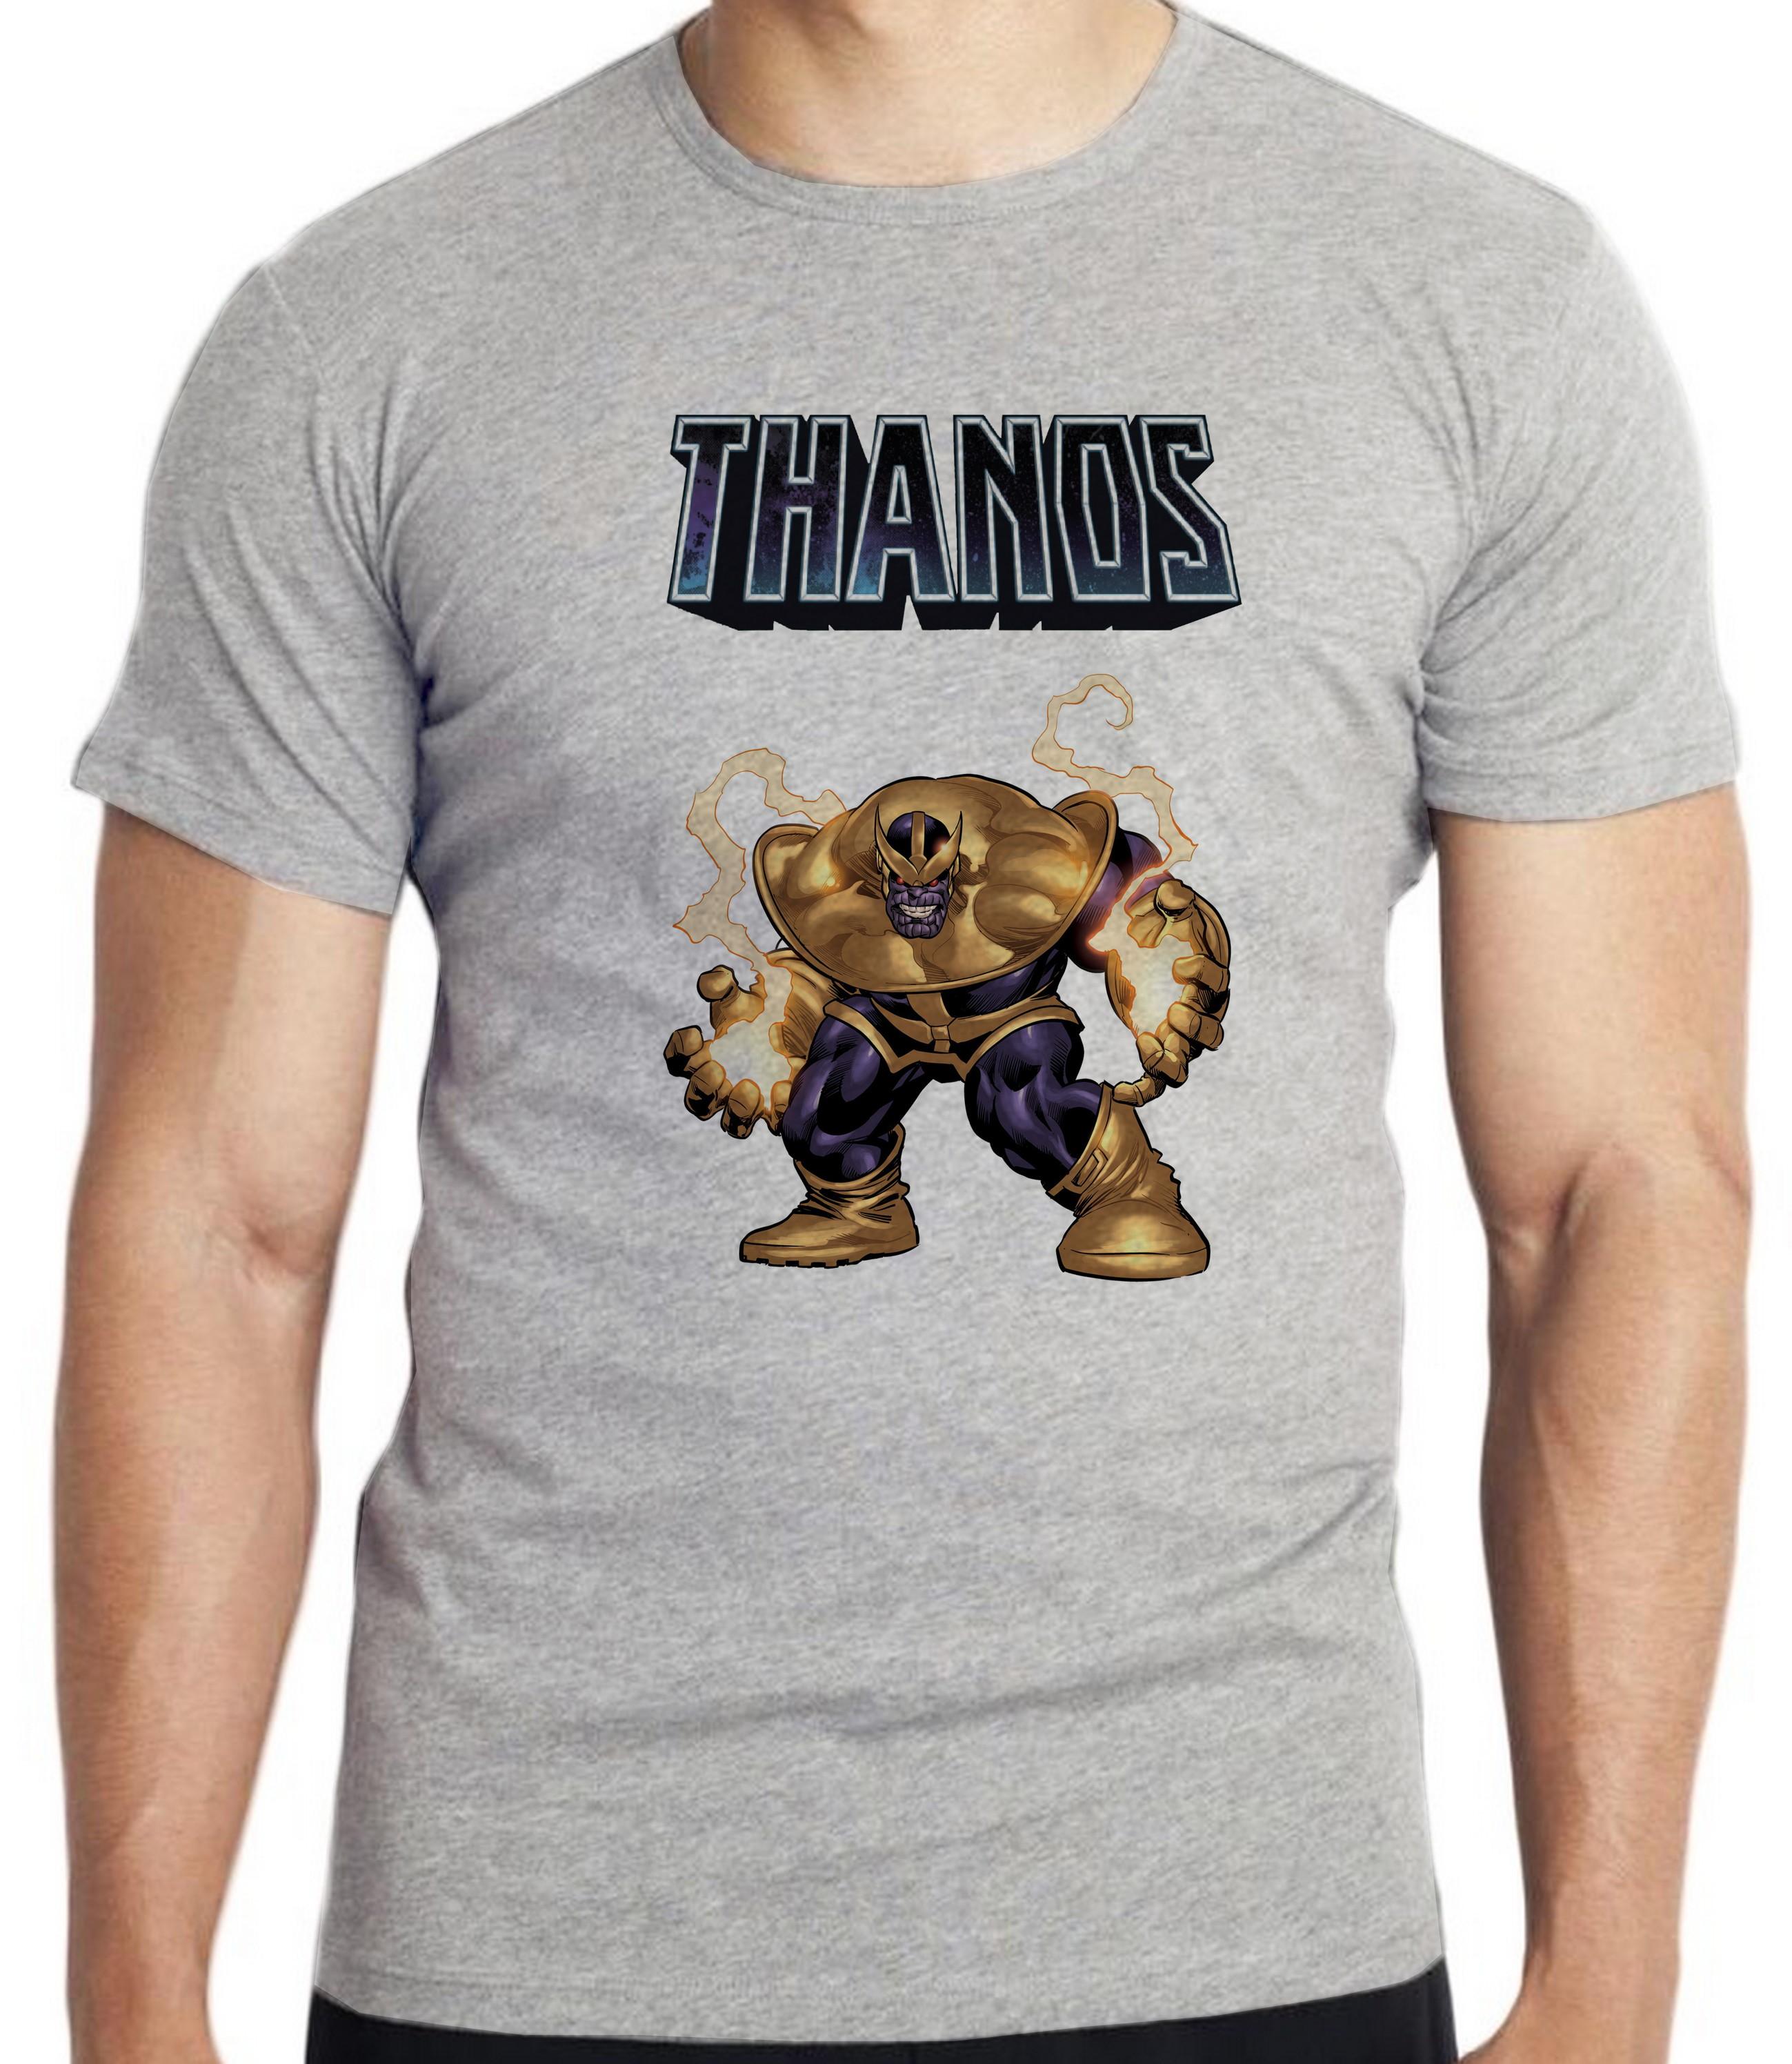 628e5882a7 Camiseta Blusa Thanos Marvel Vingadores Avengers